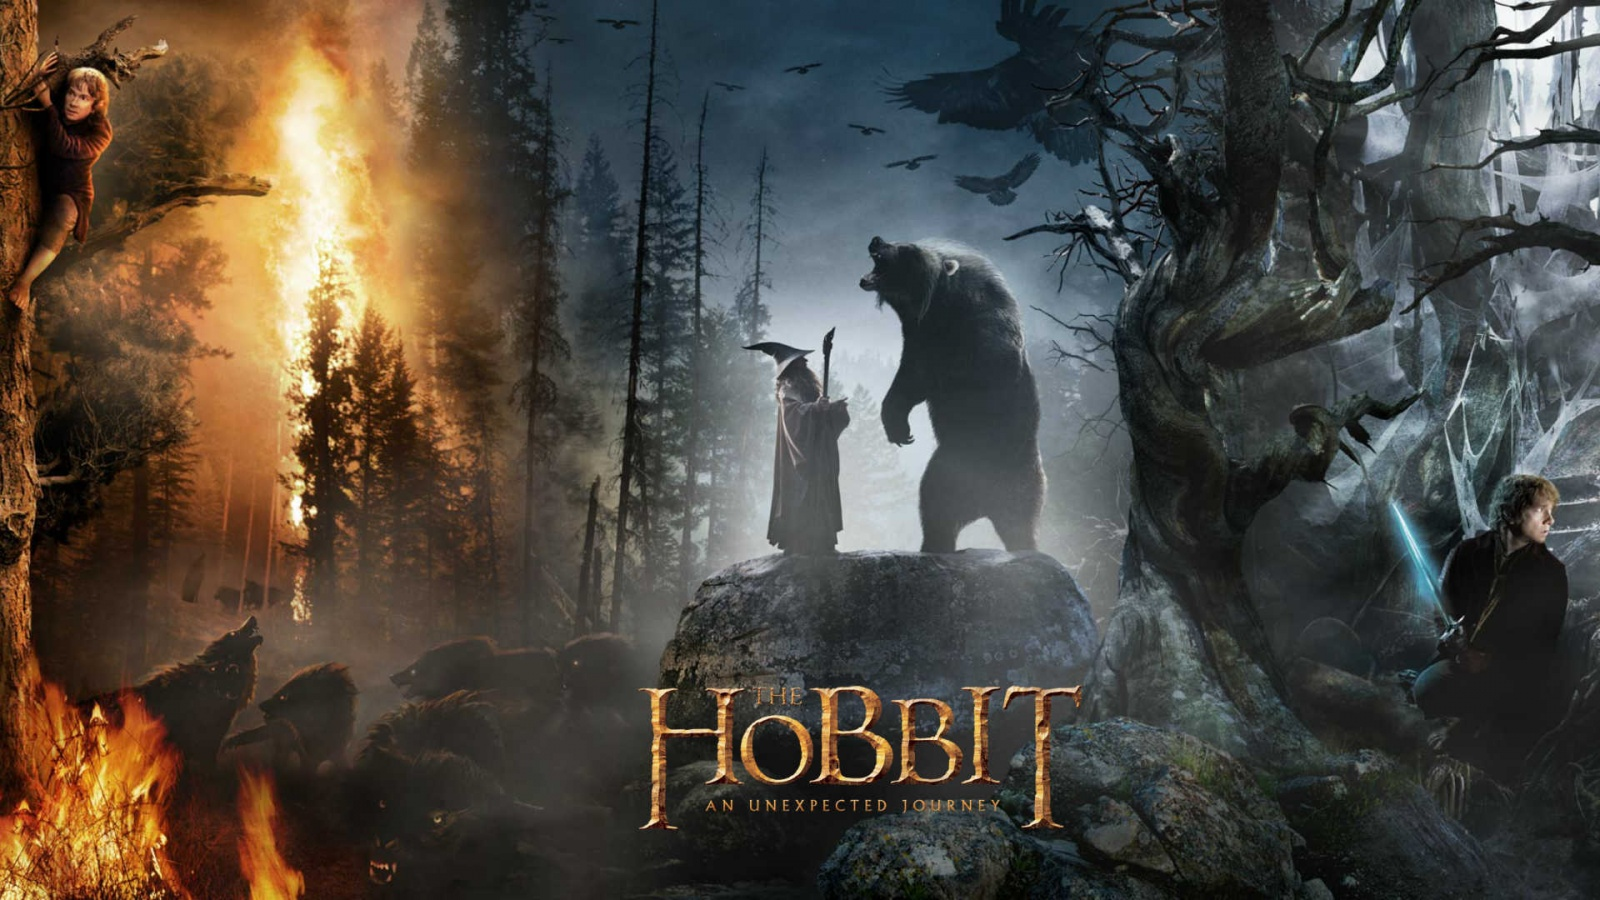 http://2.bp.blogspot.com/-PPUhic8b3nc/ULI9h61evRI/AAAAAAAABEU/PaJp4aY4RQE/s1600/the_hobbit_2012_movie-1600x900.jpg